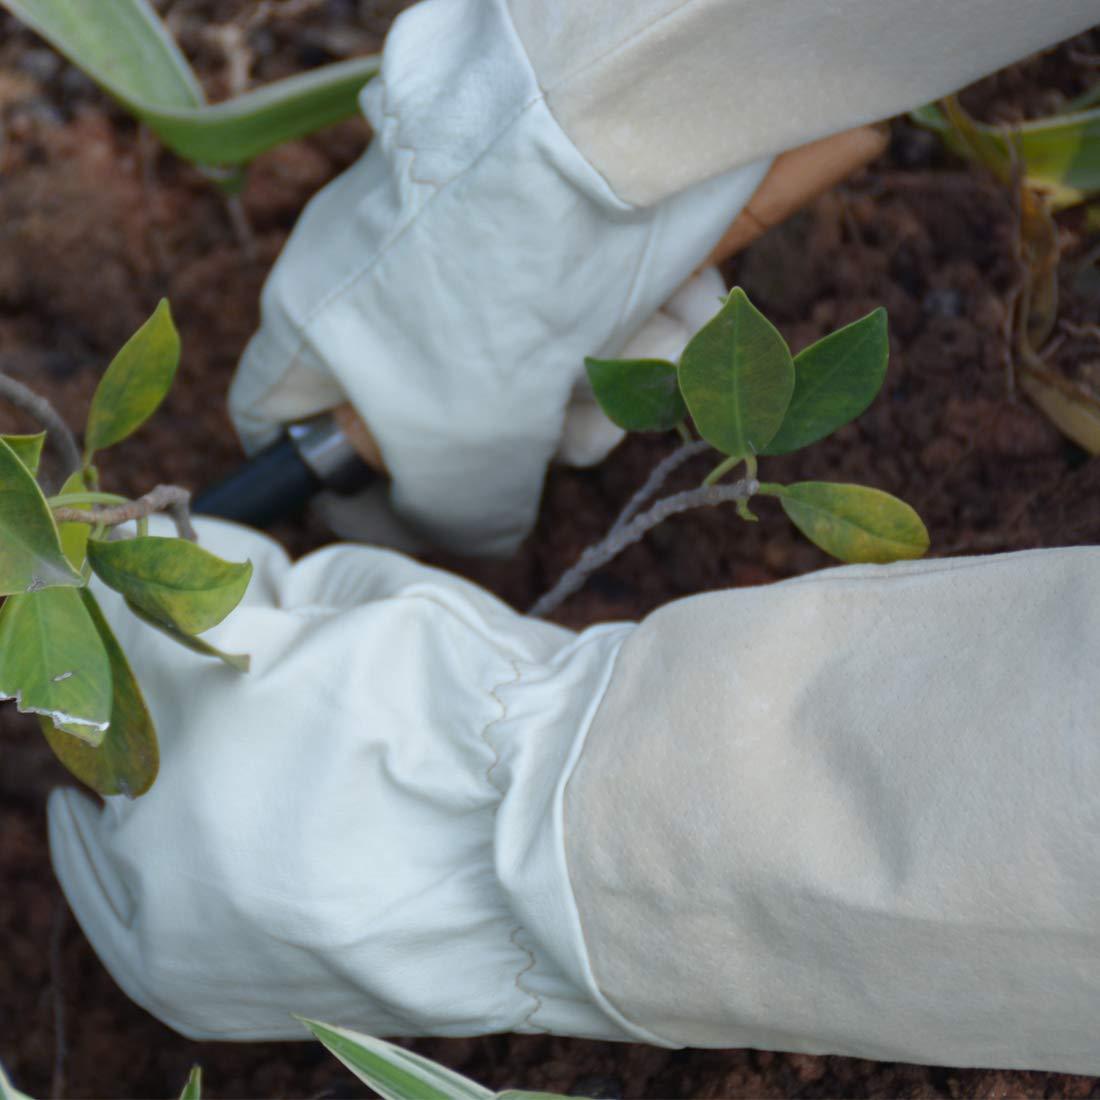 Thornproof Leder Gartenhandschuhe Langarm f/ür Frauen und M/änner L Rose Beschneiden Floral Gauntlet Garten Handschuhe